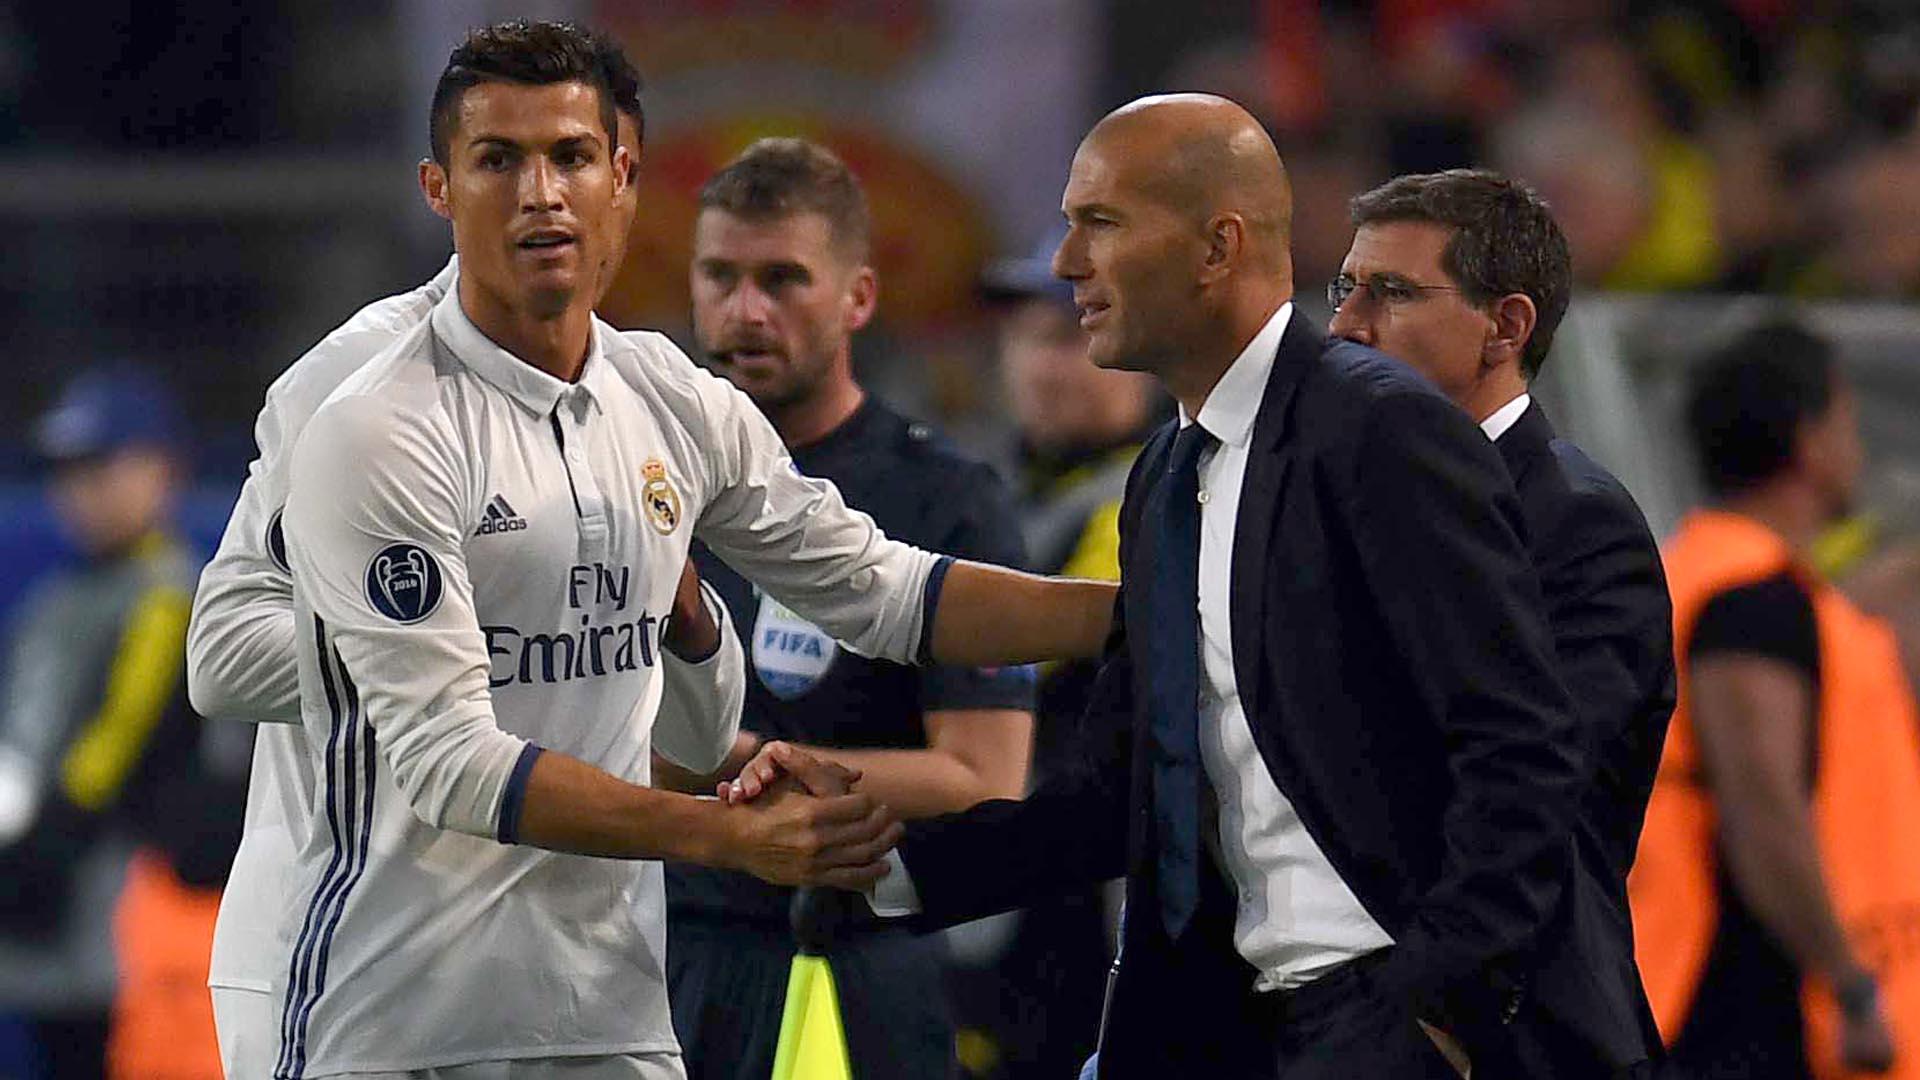 Real Madrid Borussia Dortmund Cristiano Ronaldo Zinedine Zidane UEFA Champions League